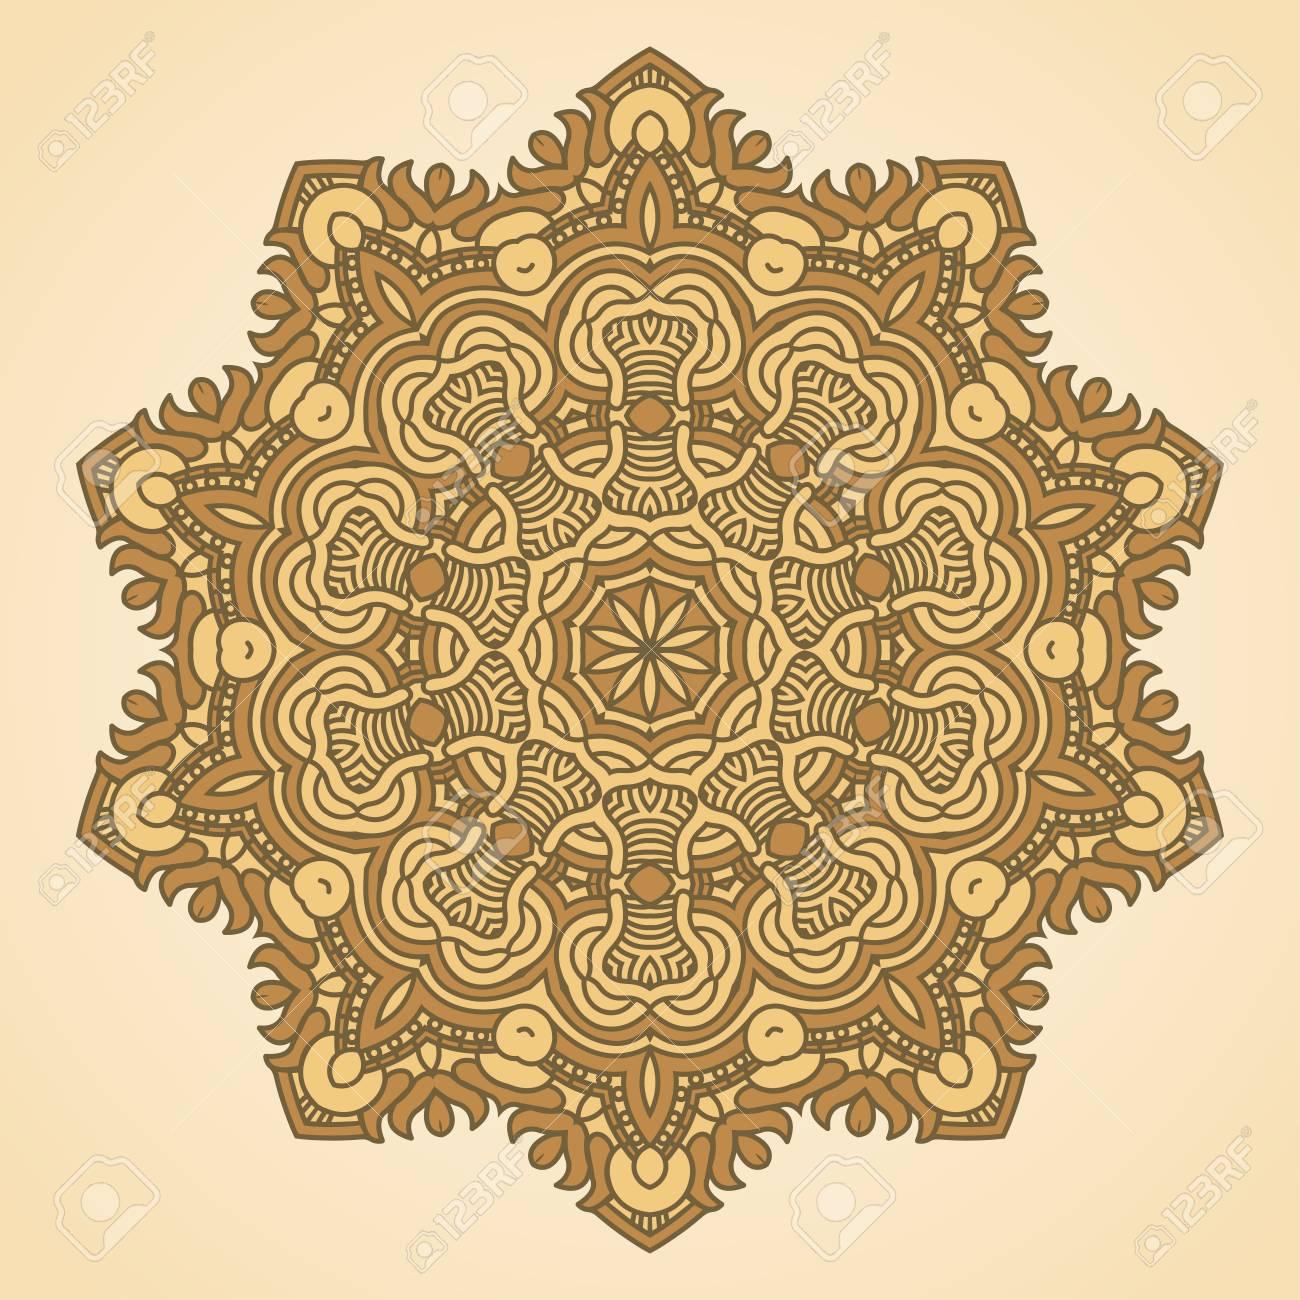 Vector round decorative design element Stock Vector - 17421841